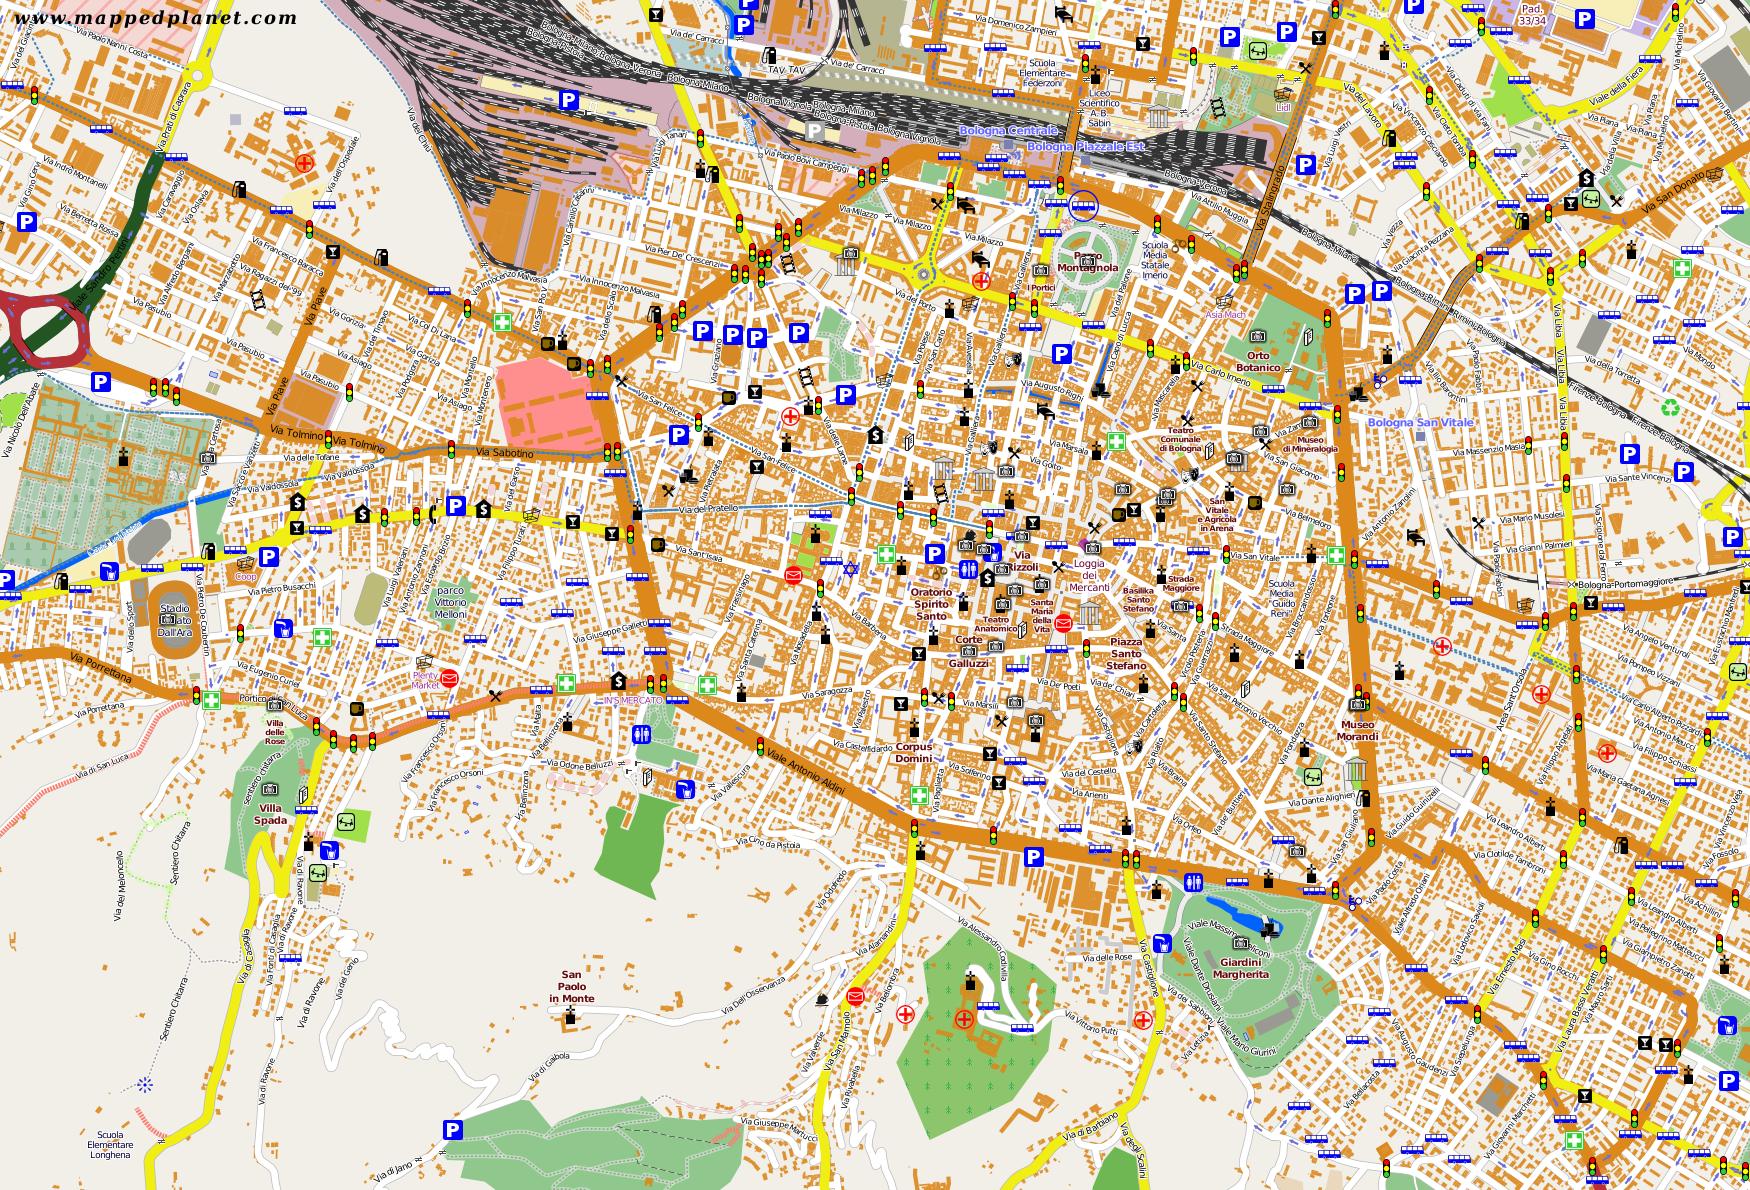 show map of italy with Citymaps 579 Bologna on Civita di Bagnoregio further Citymaps 958 Trieste furthermore Il Belvedere Matera besides Corfu Tourist Map also Tourism G187900 Piombino Province of Livorno Tuscany Vacations.